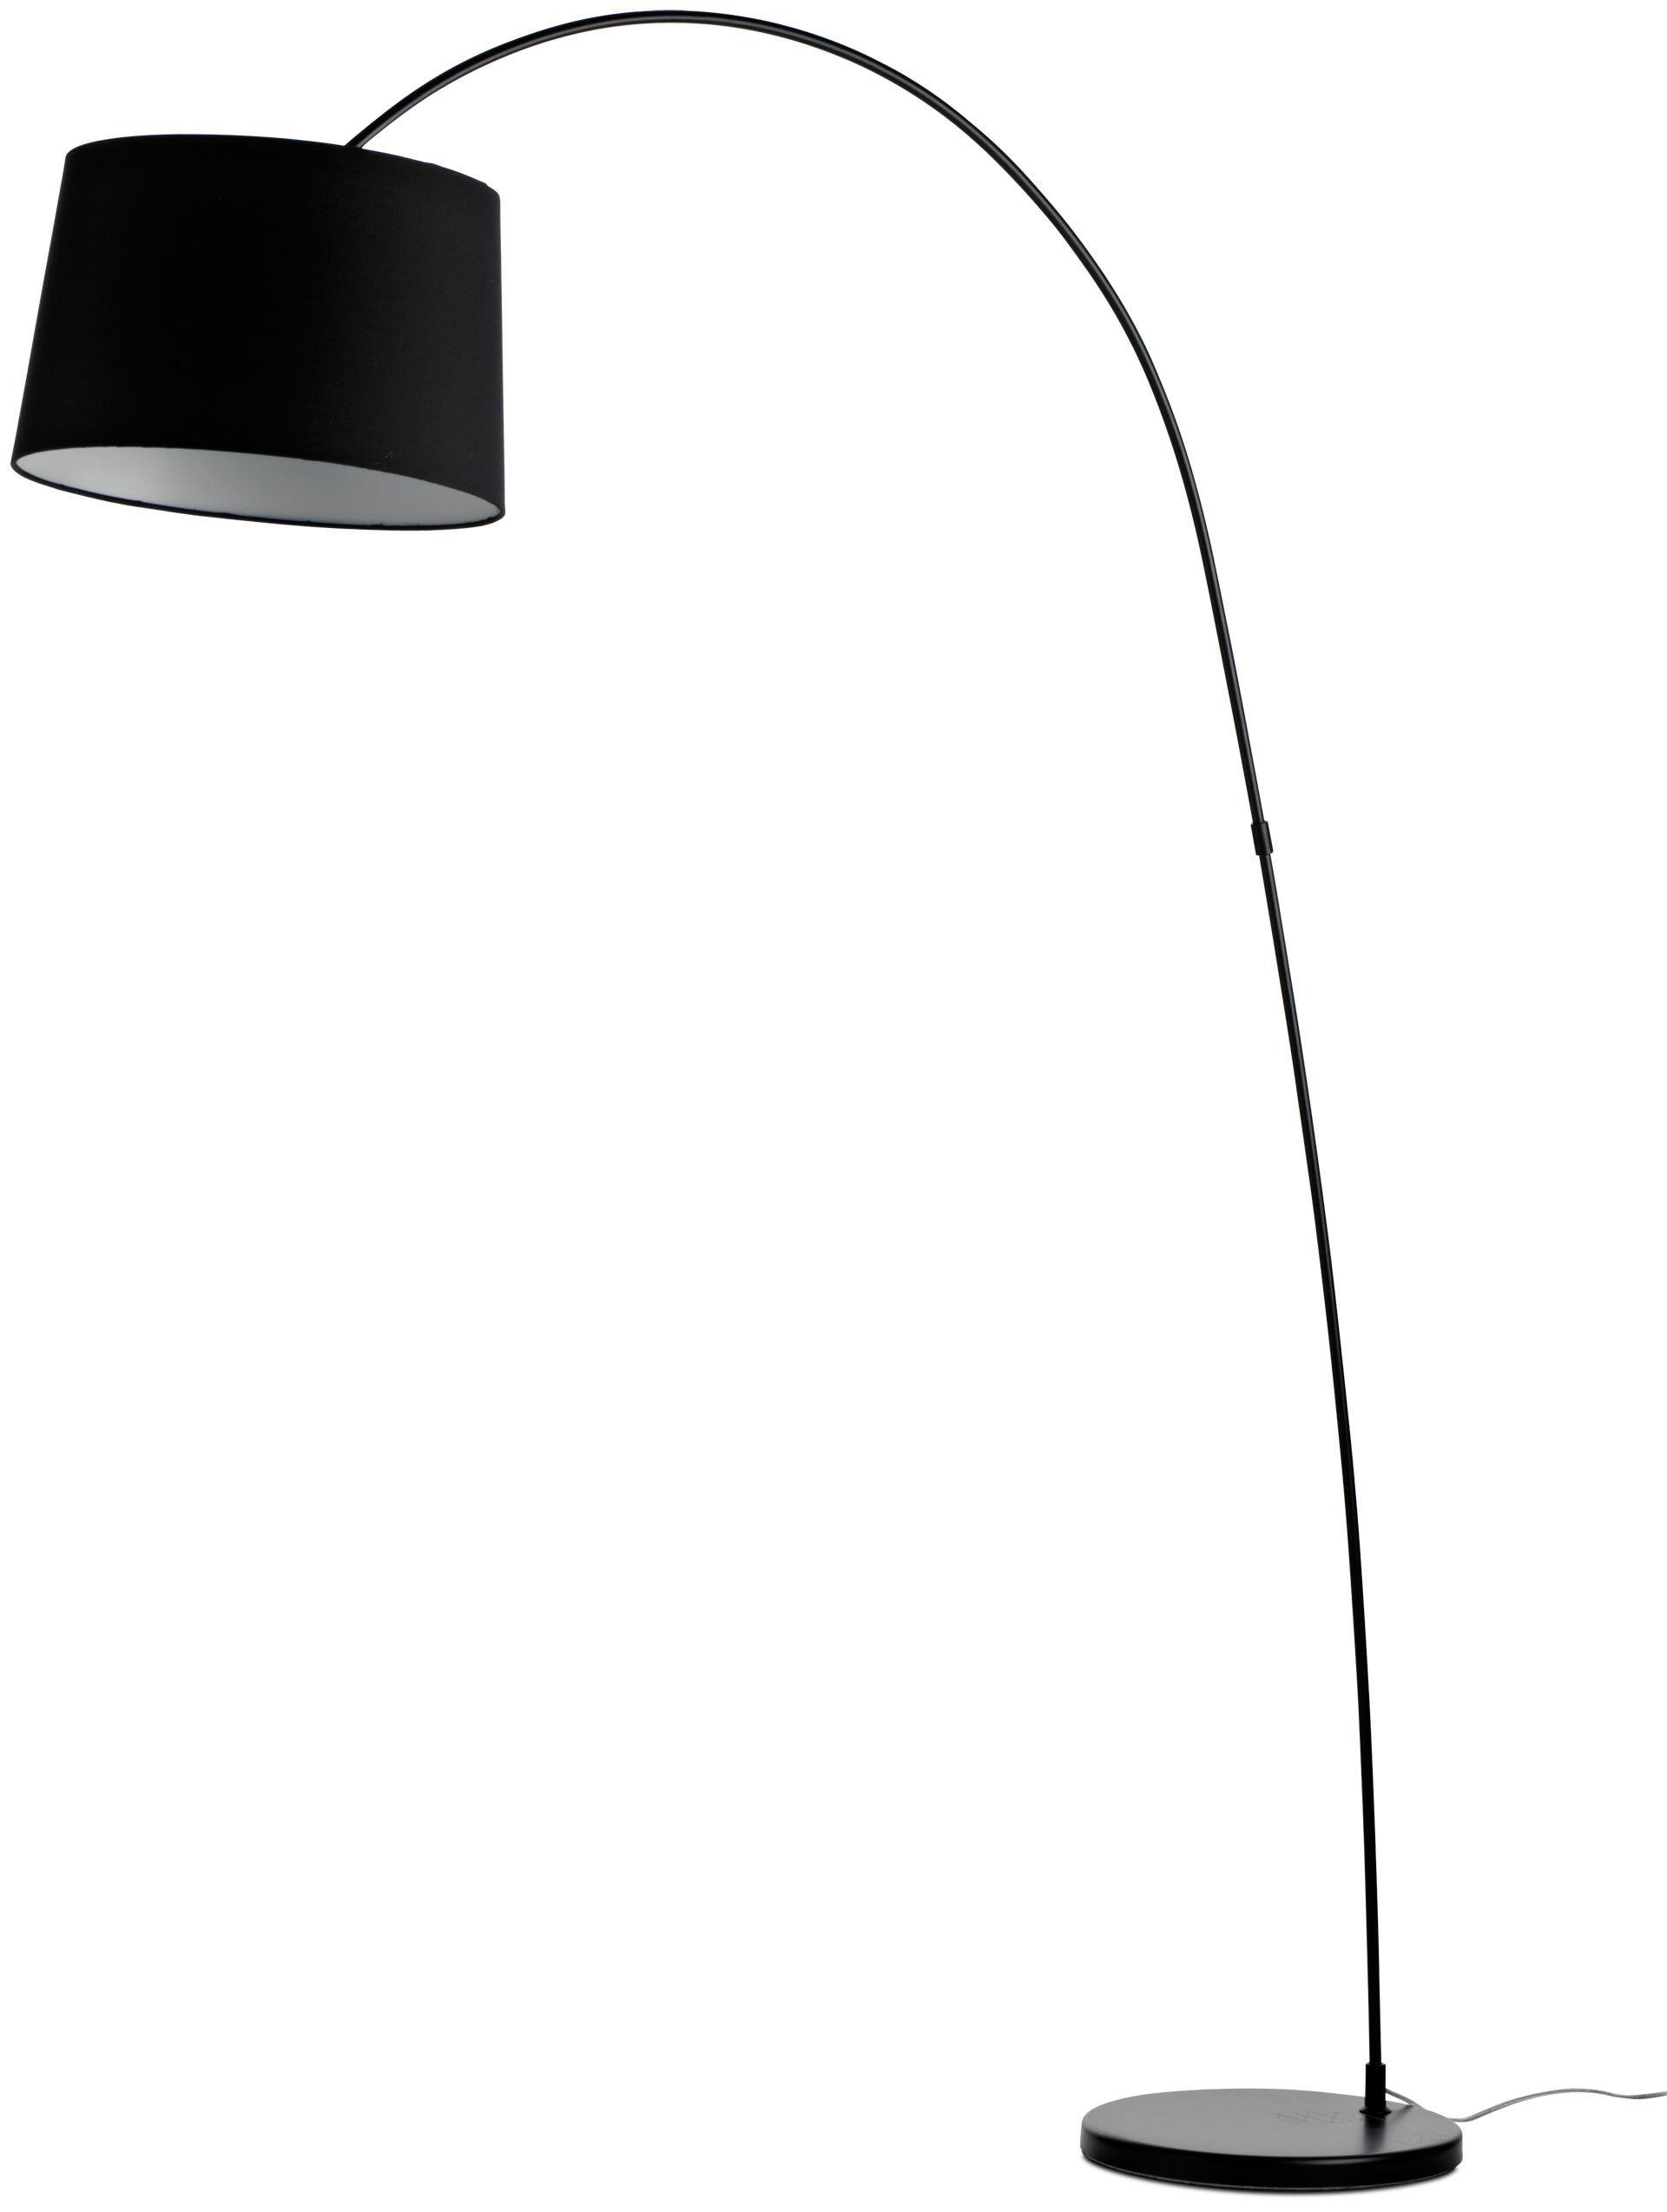 Kuta Floor Lamp Test The Concept And All Our Nrew Furniture In The Berlin Apartment Floor Lamp Bedroom Diy Floor Lamp Wall Lamp Design